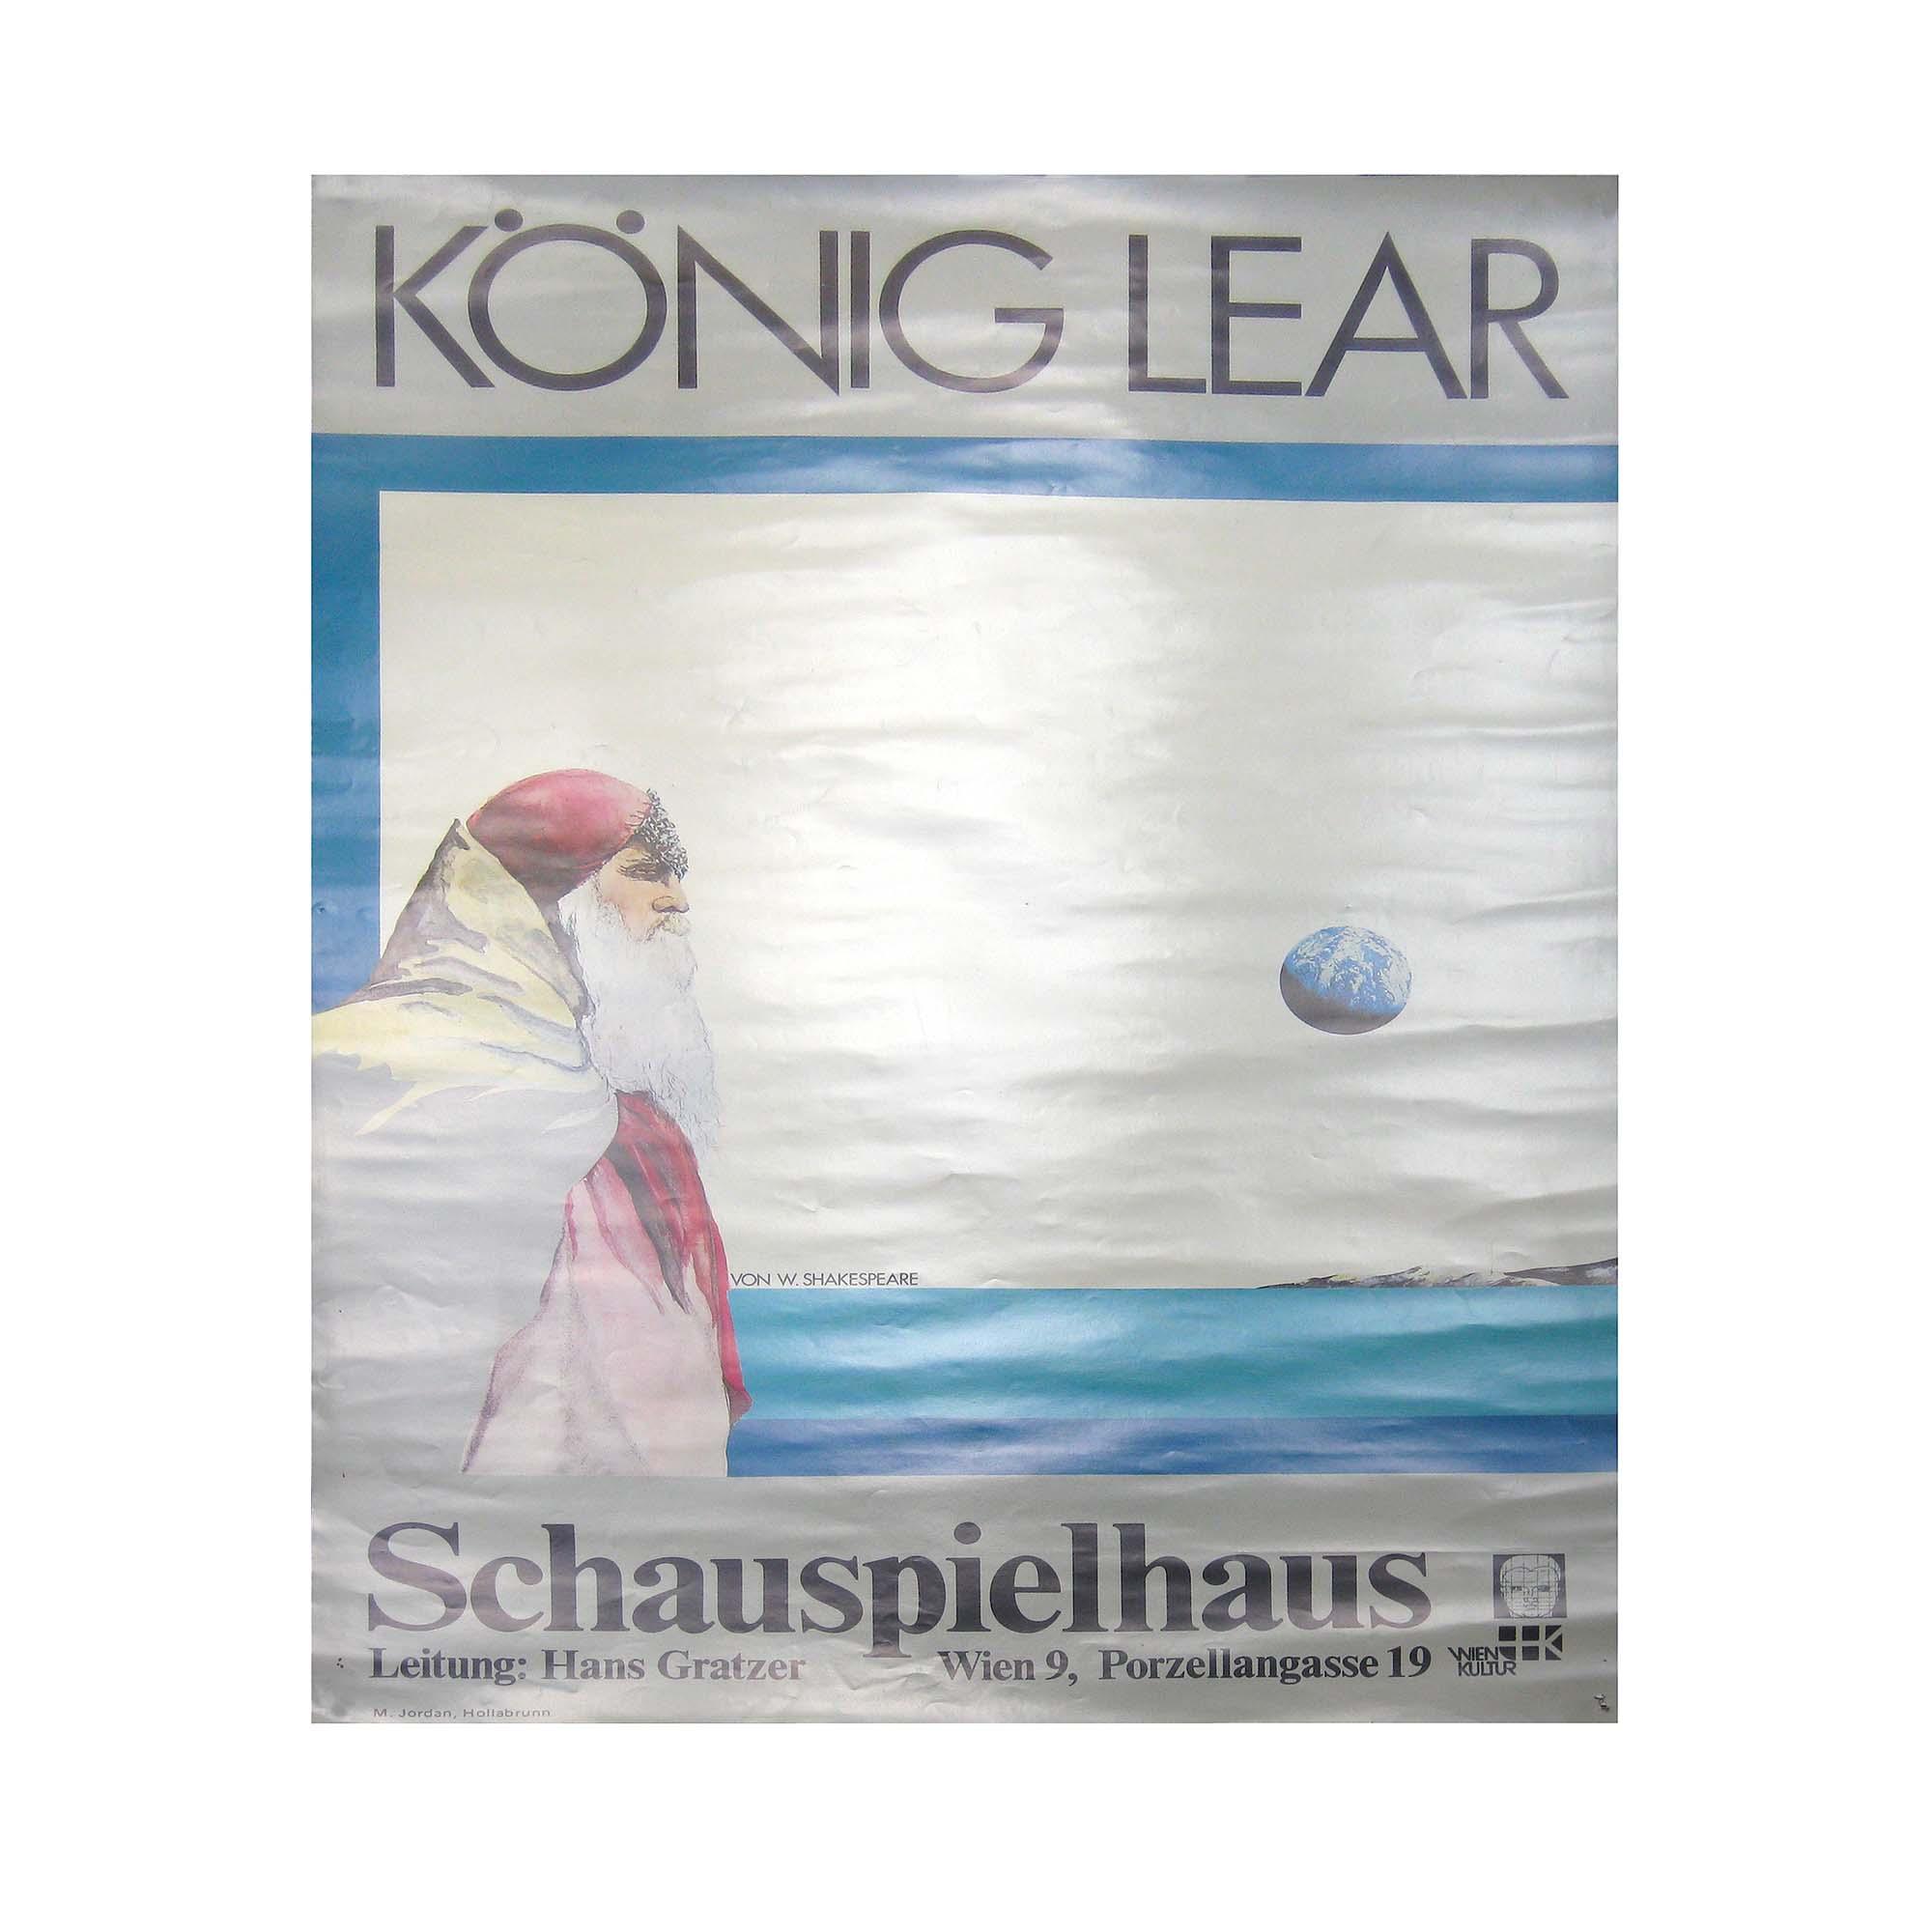 8045-Plakat-Shakespeare-Schauspielhaus-1982-1N.jpg